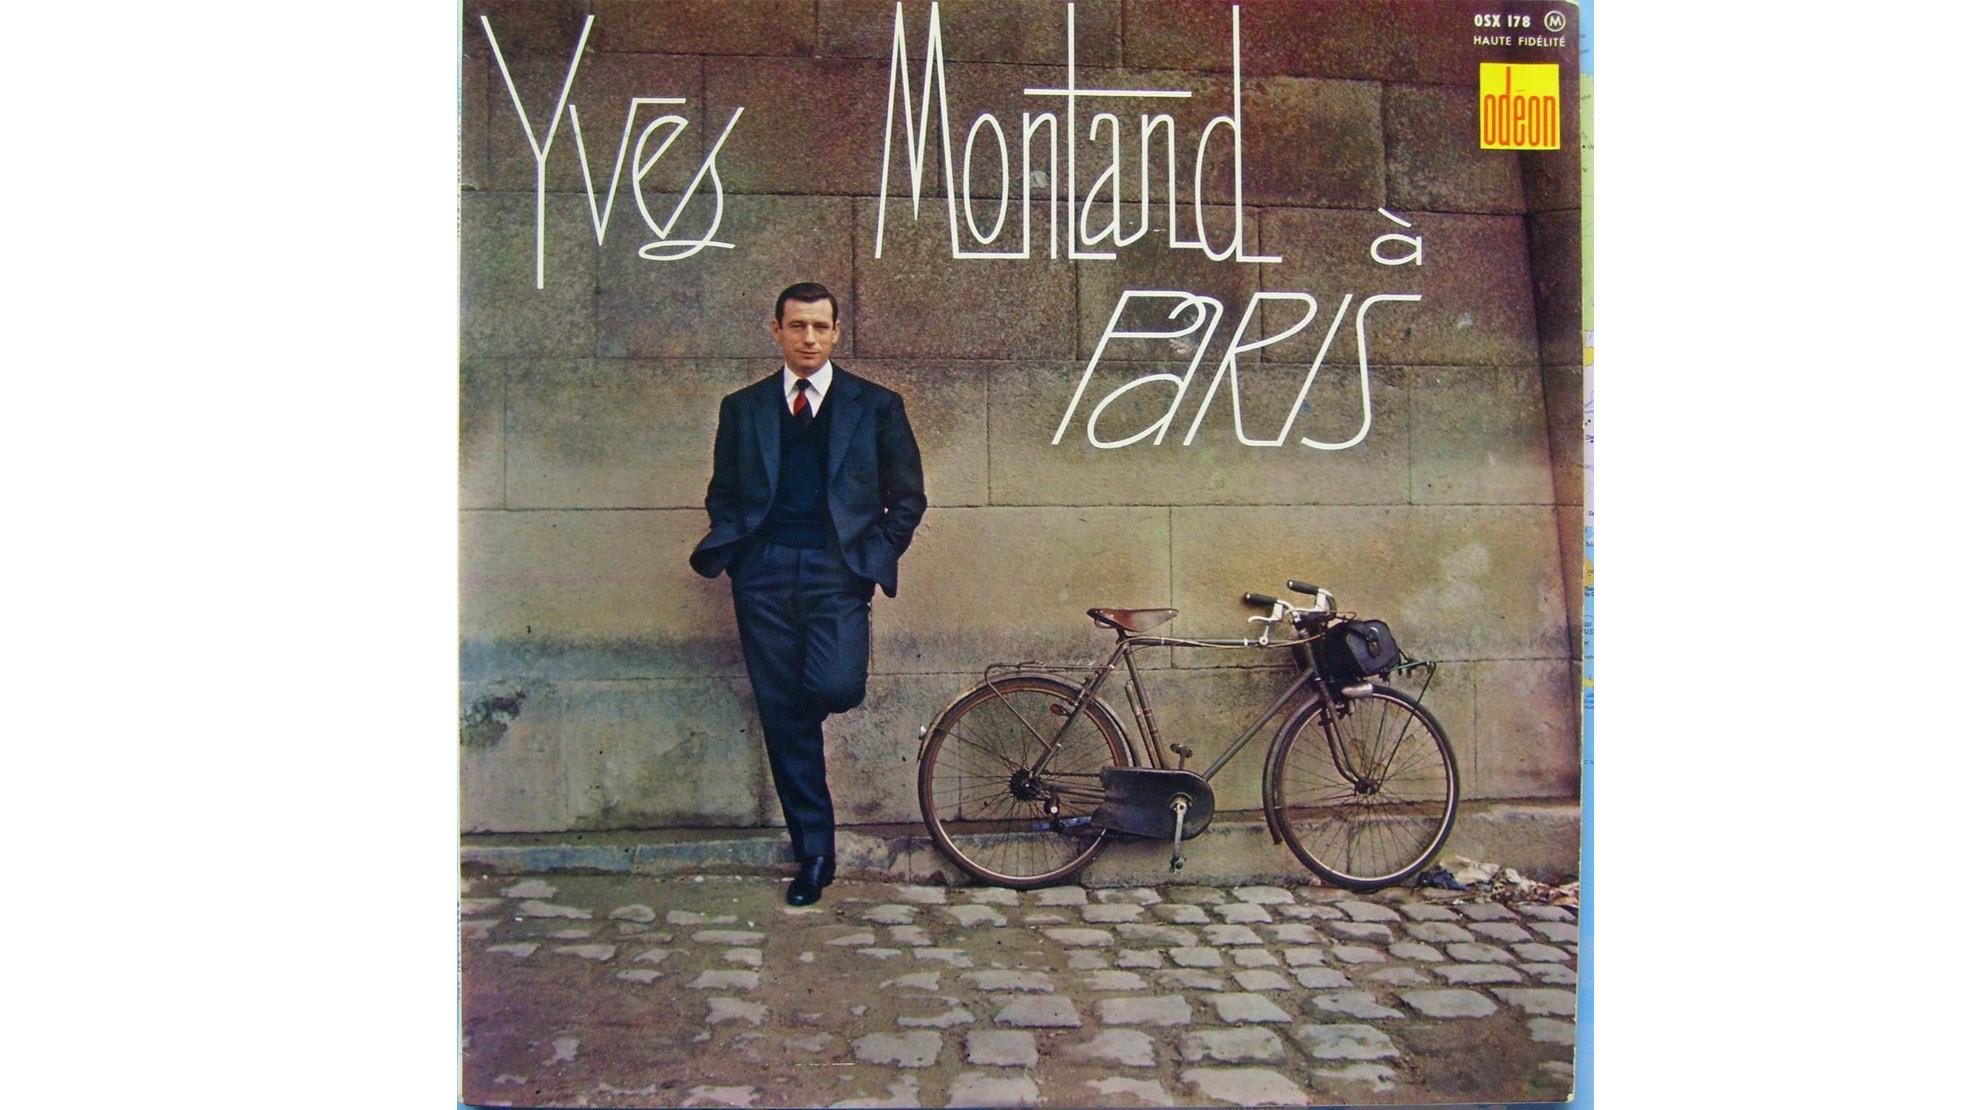 Yves Montand • A Paris (1962)